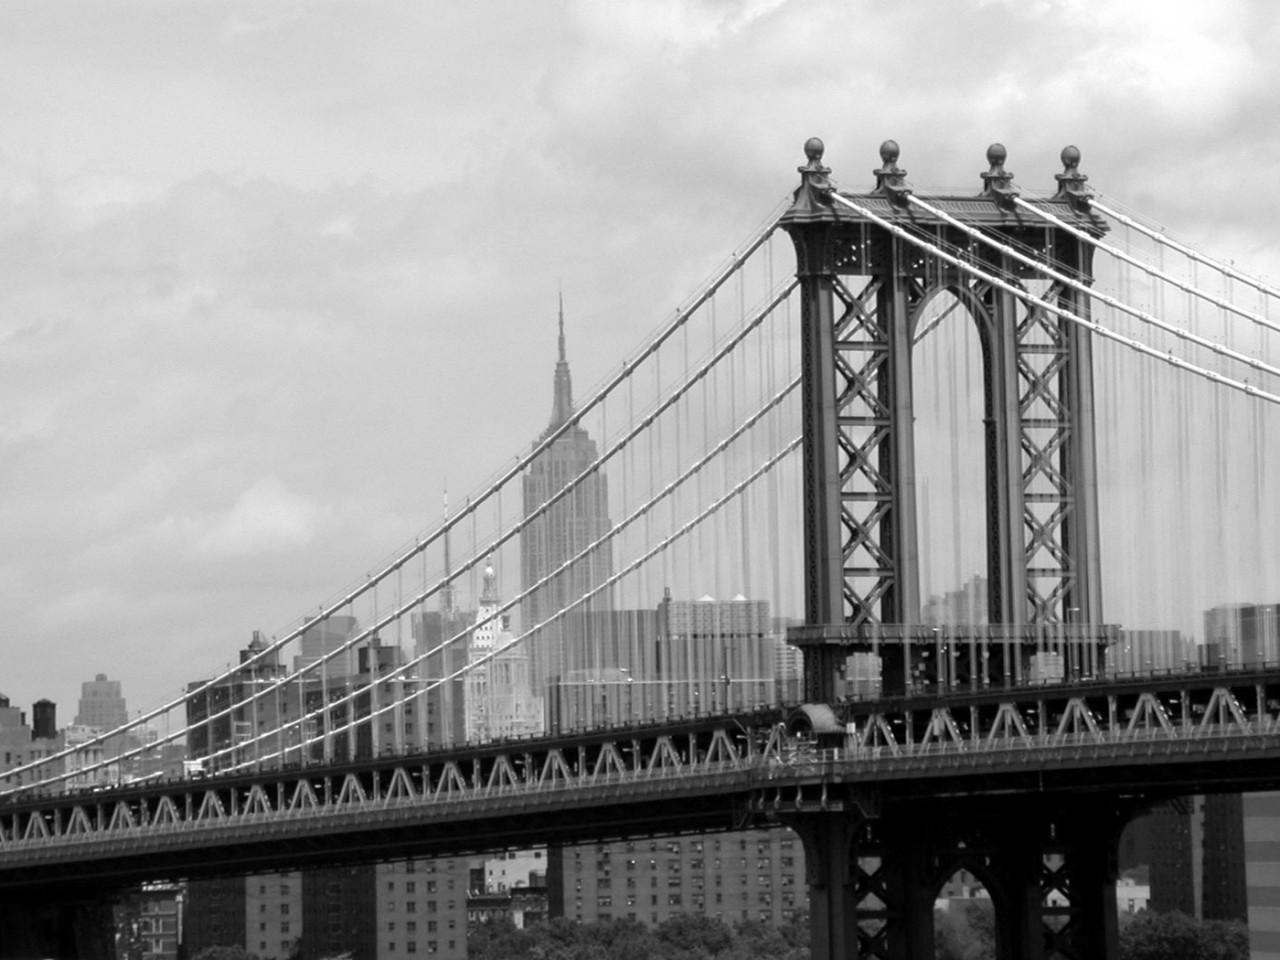 Hd Desktop Wallpapers For Windows 7 Manhattan Bridge Hd Wallpapers